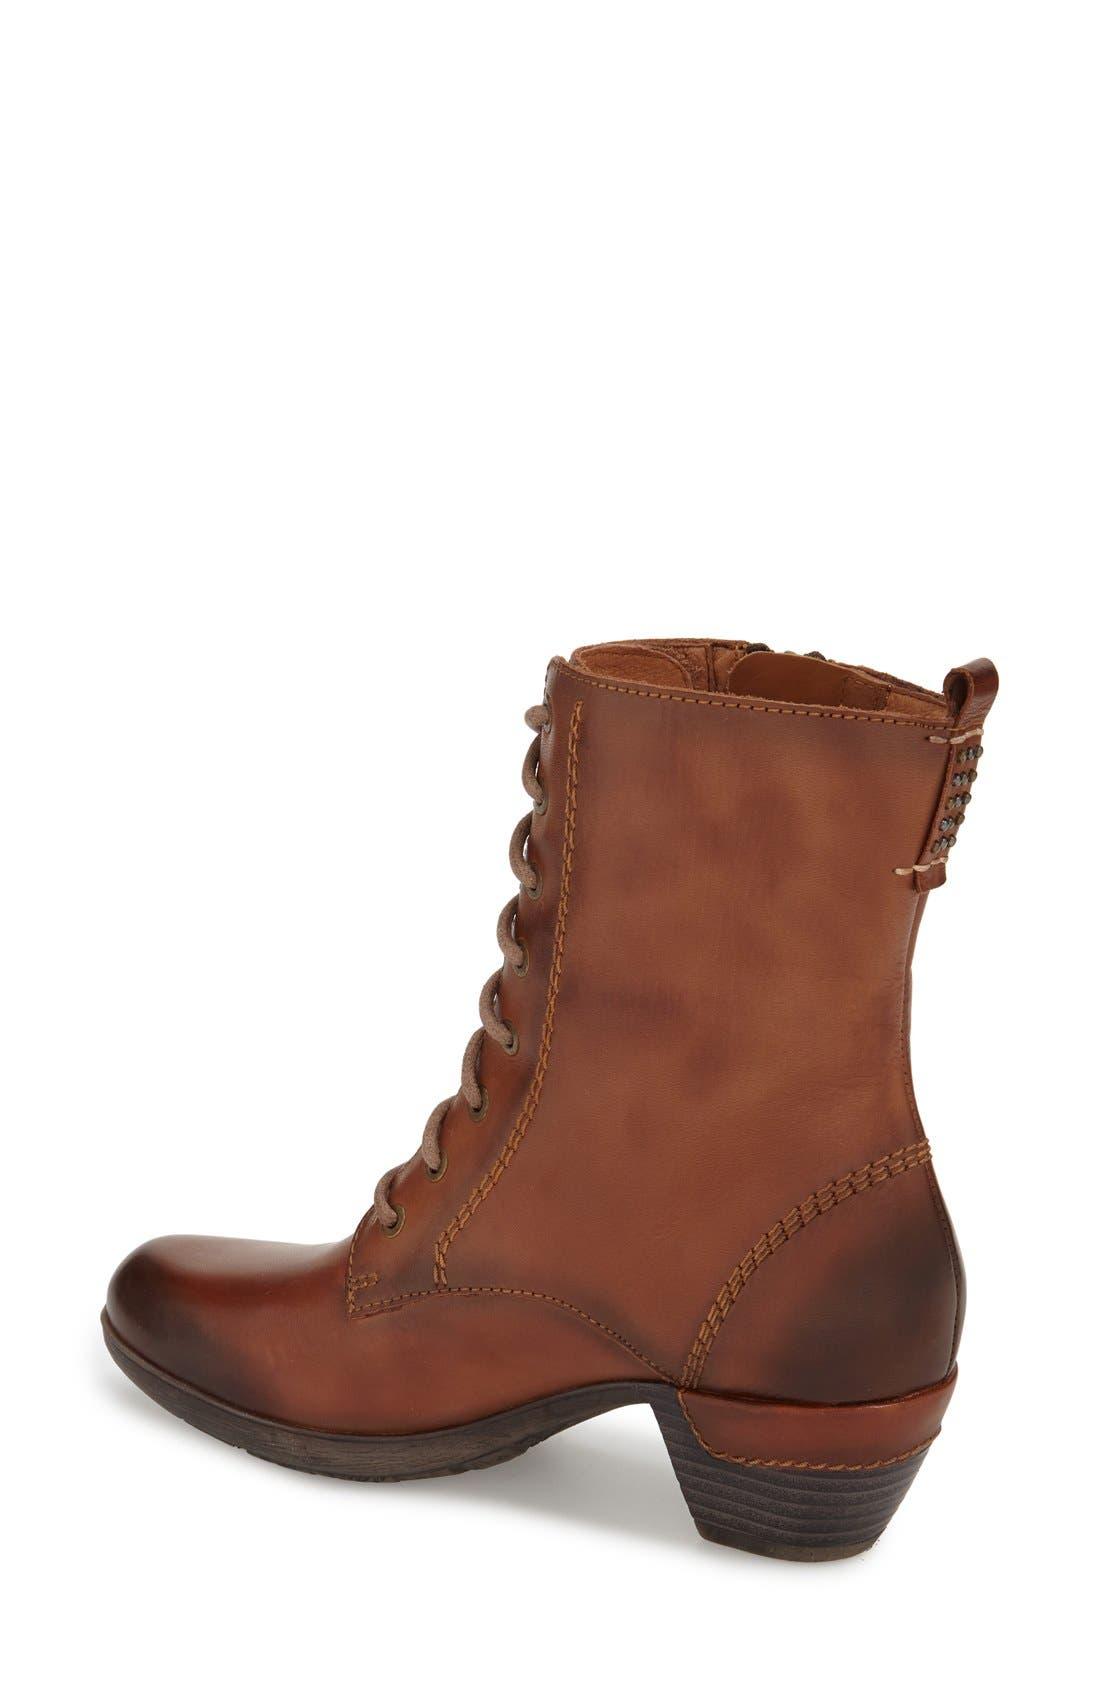 Alternate Image 2  - PIKOLINOS 'Rotterdam' Lace-Up Boot (Women)